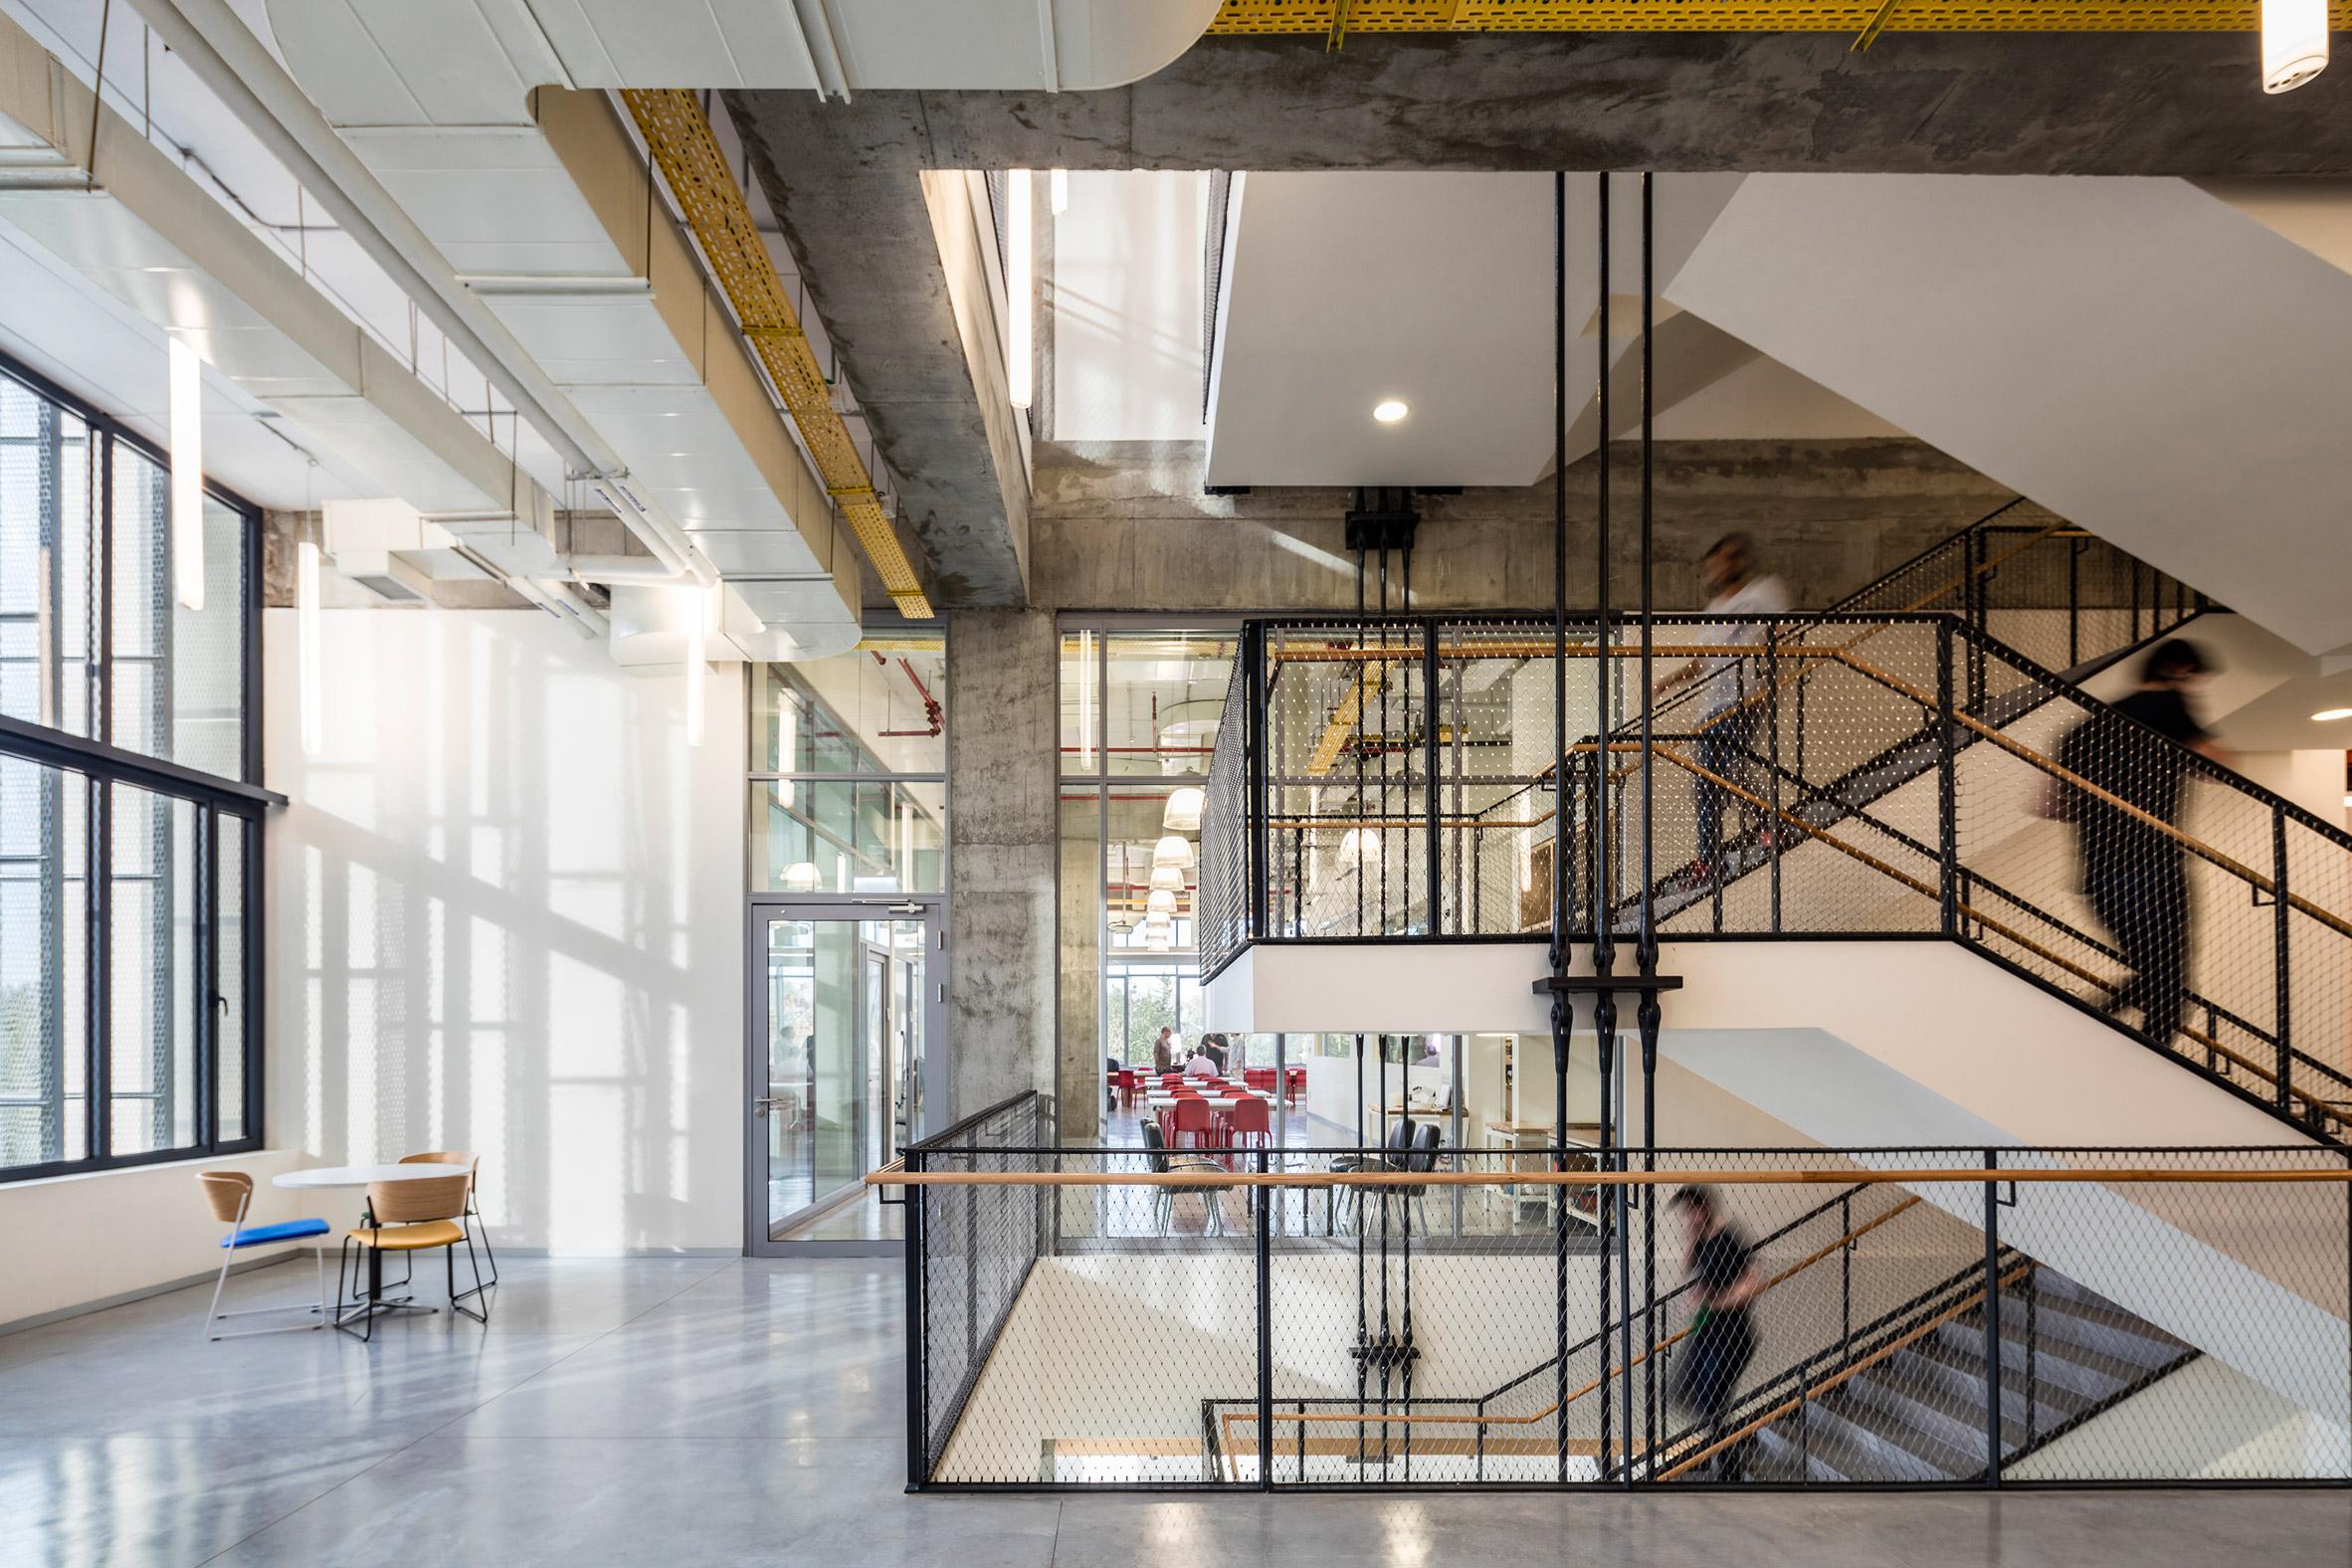 Fins of metal mesh and concrete shield Tel Aviv school of entrepreneurship from the sun